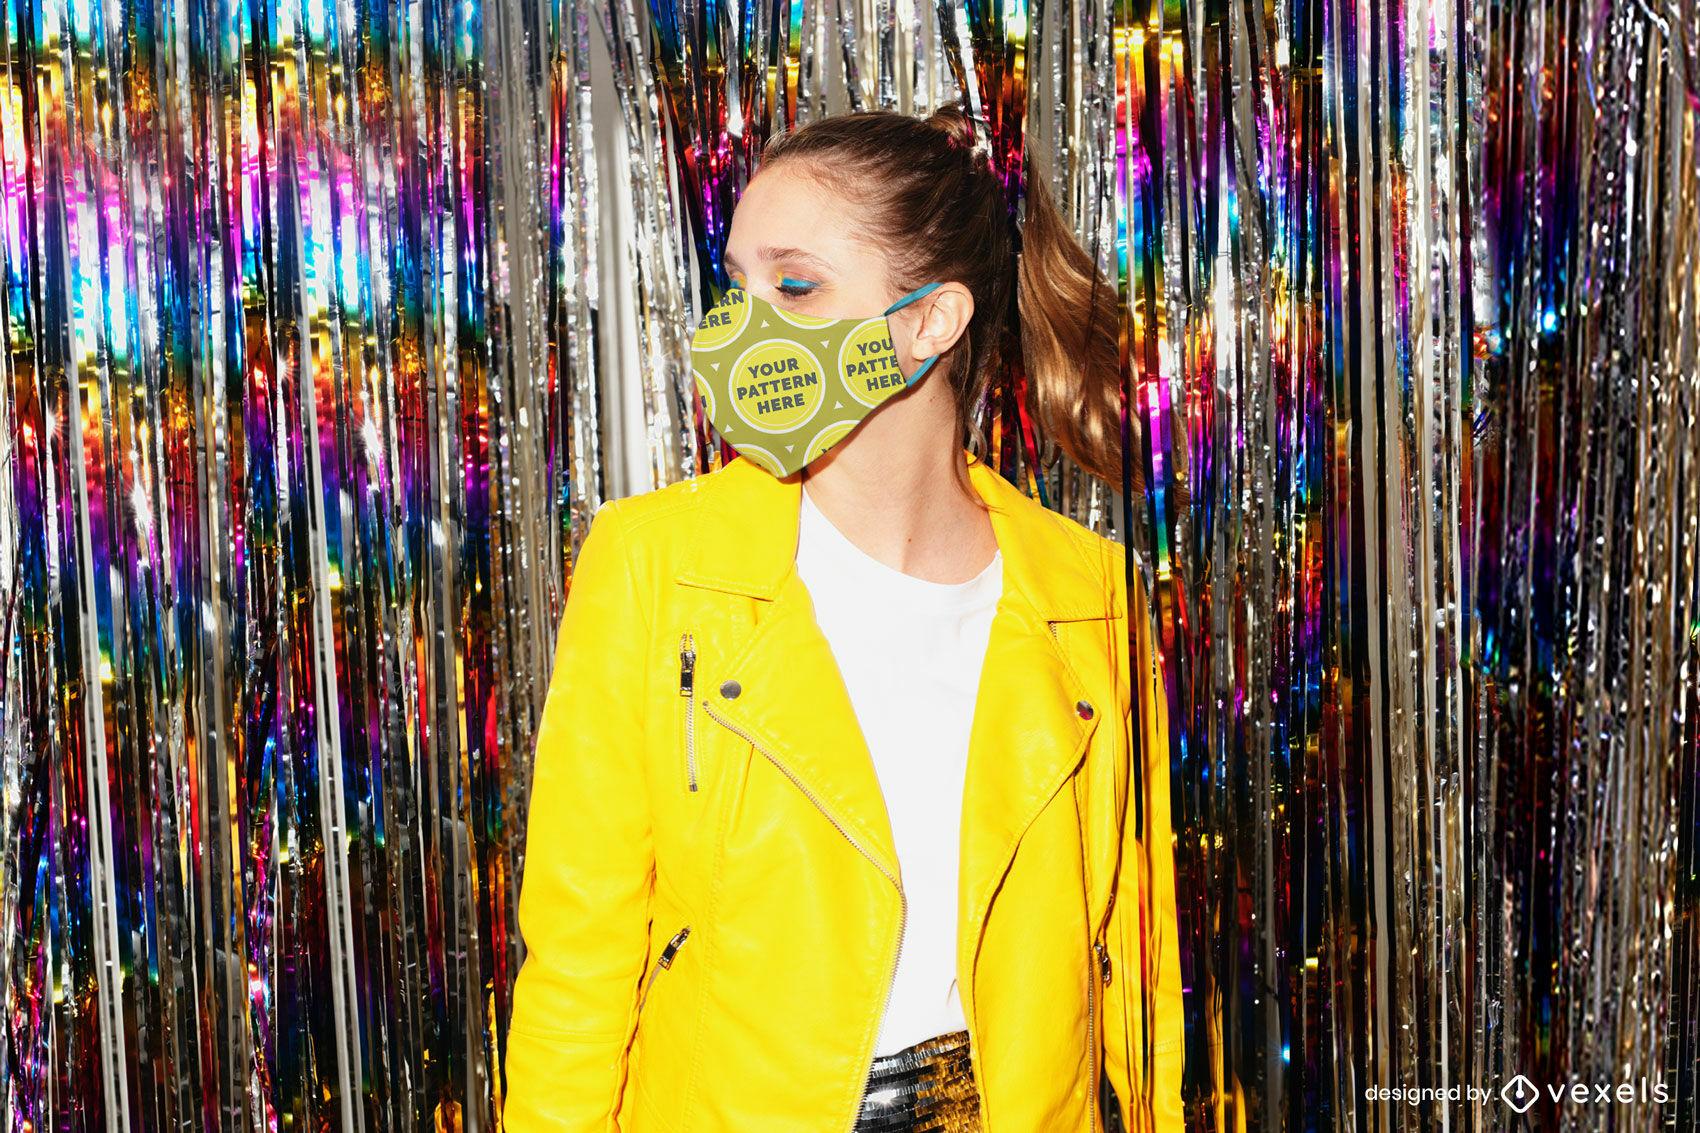 Chica de maqueta de máscara facial en fondo de fiesta de chaqueta amarilla